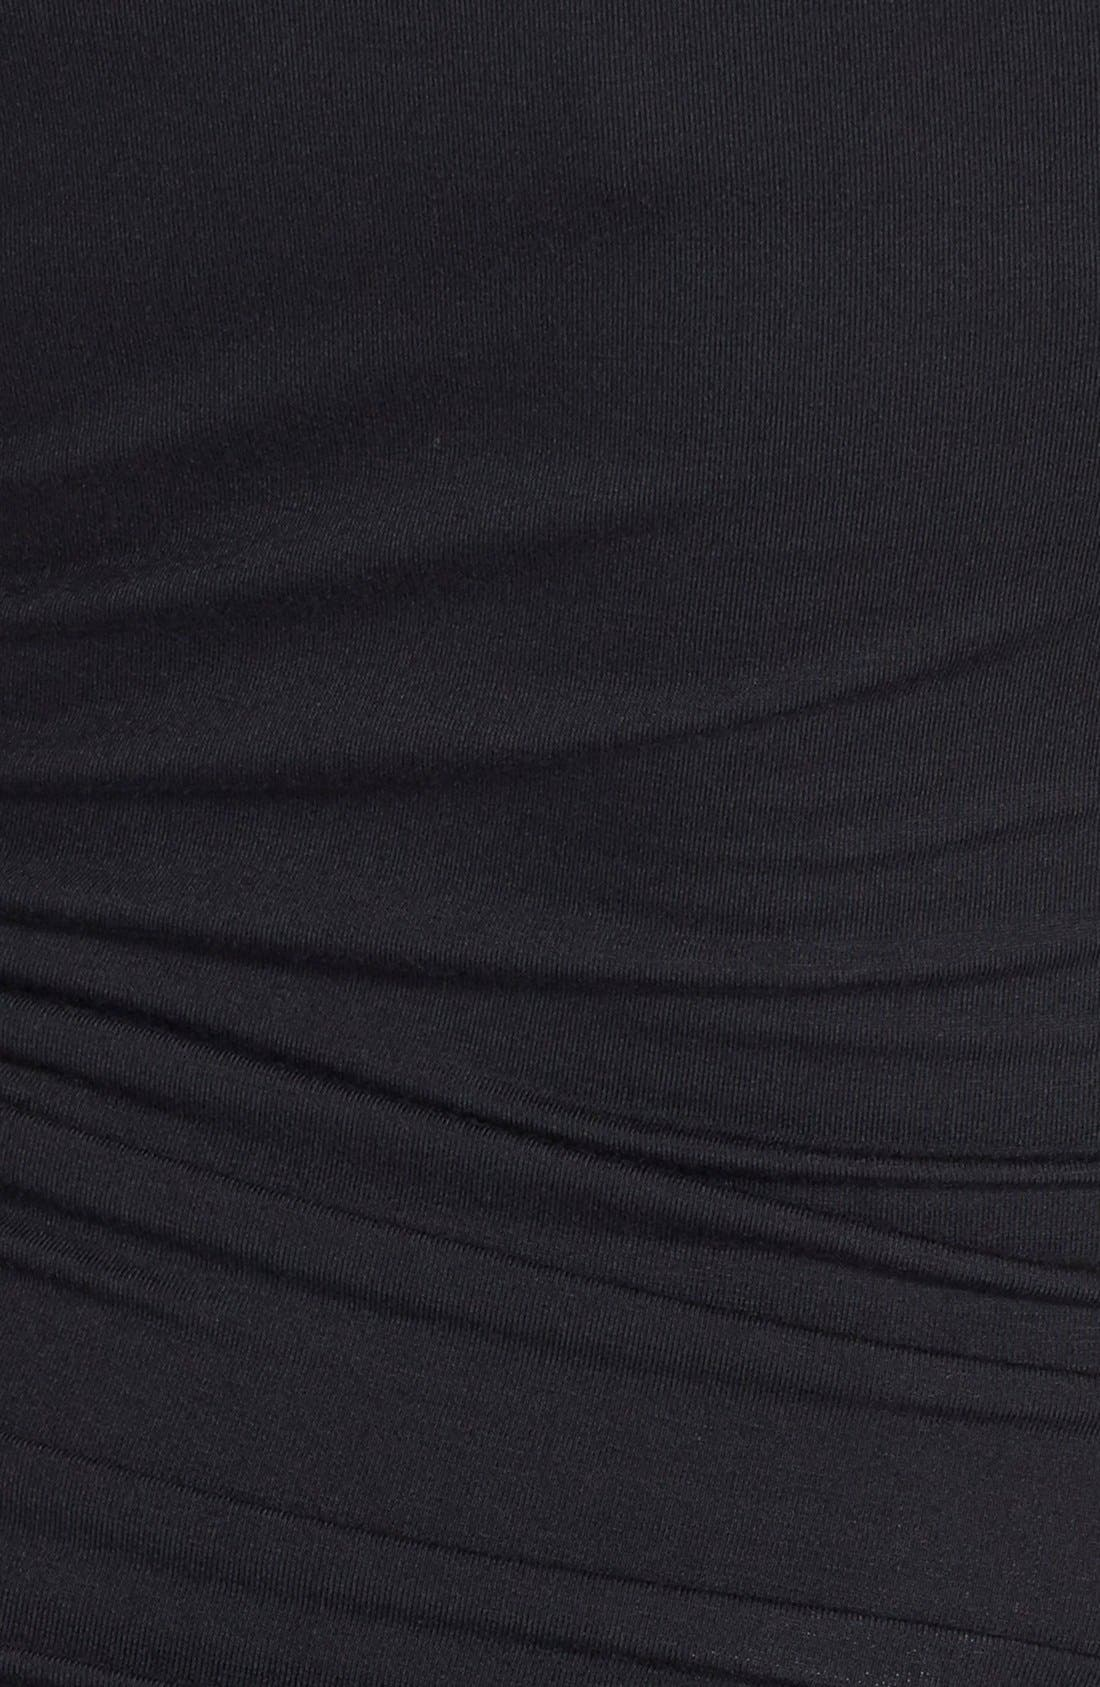 'Stella' Striped Jersey Maternity Dress,                             Alternate thumbnail 6, color,                             BLACK